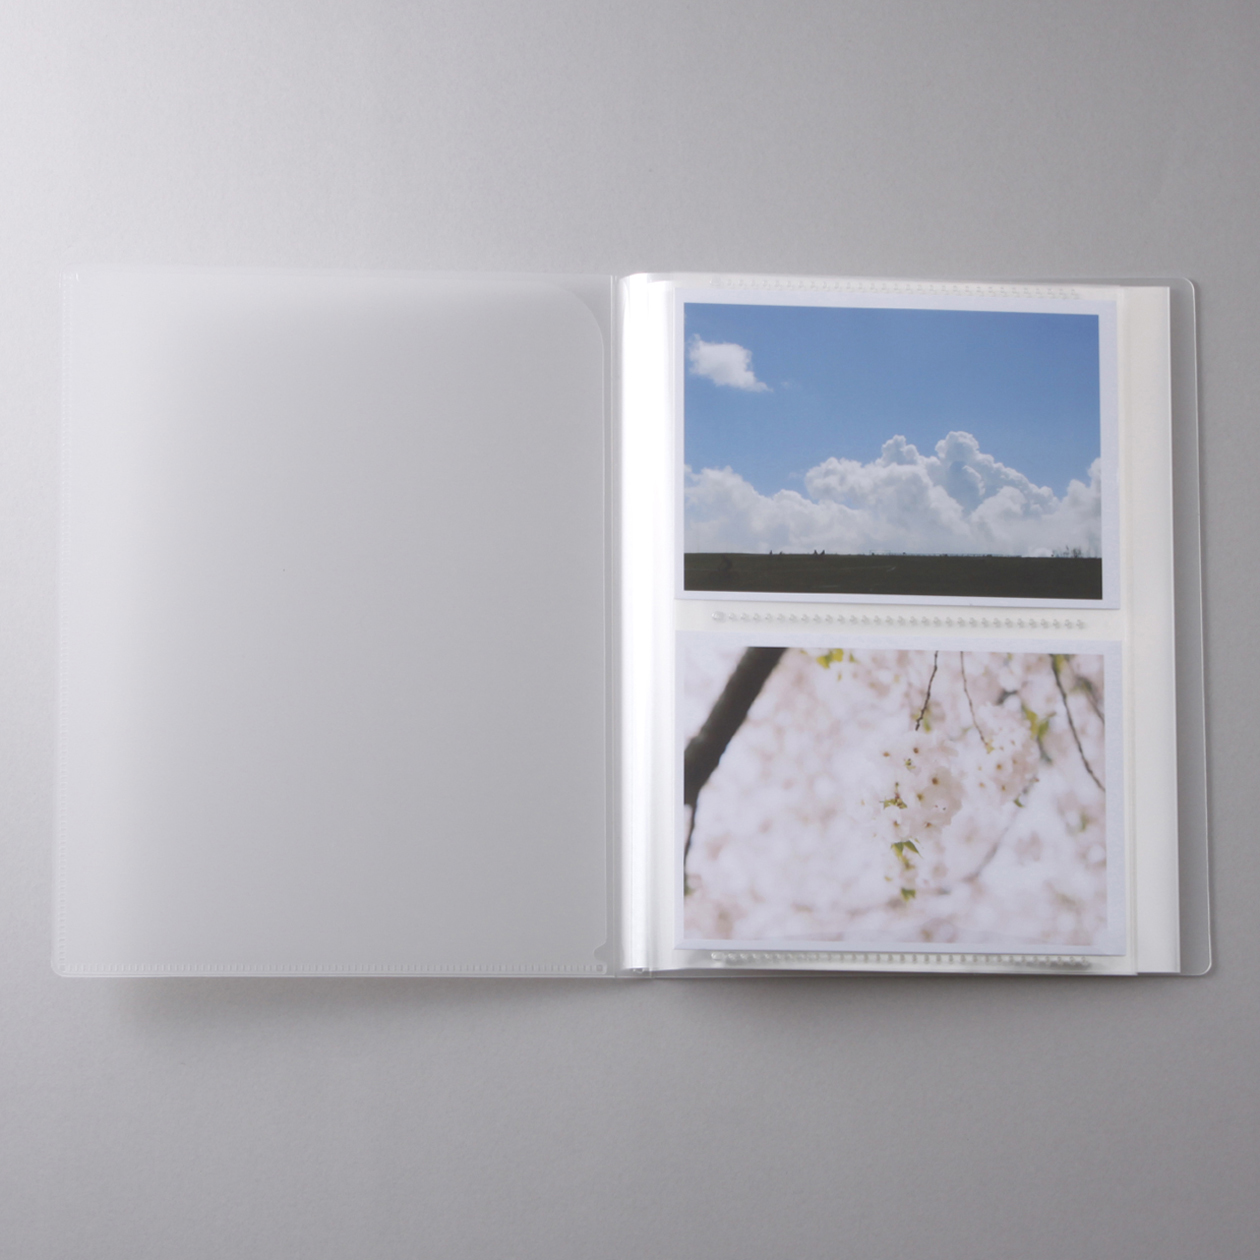 Extrem PP Album 3R | 無印良品 MUJI BQ01